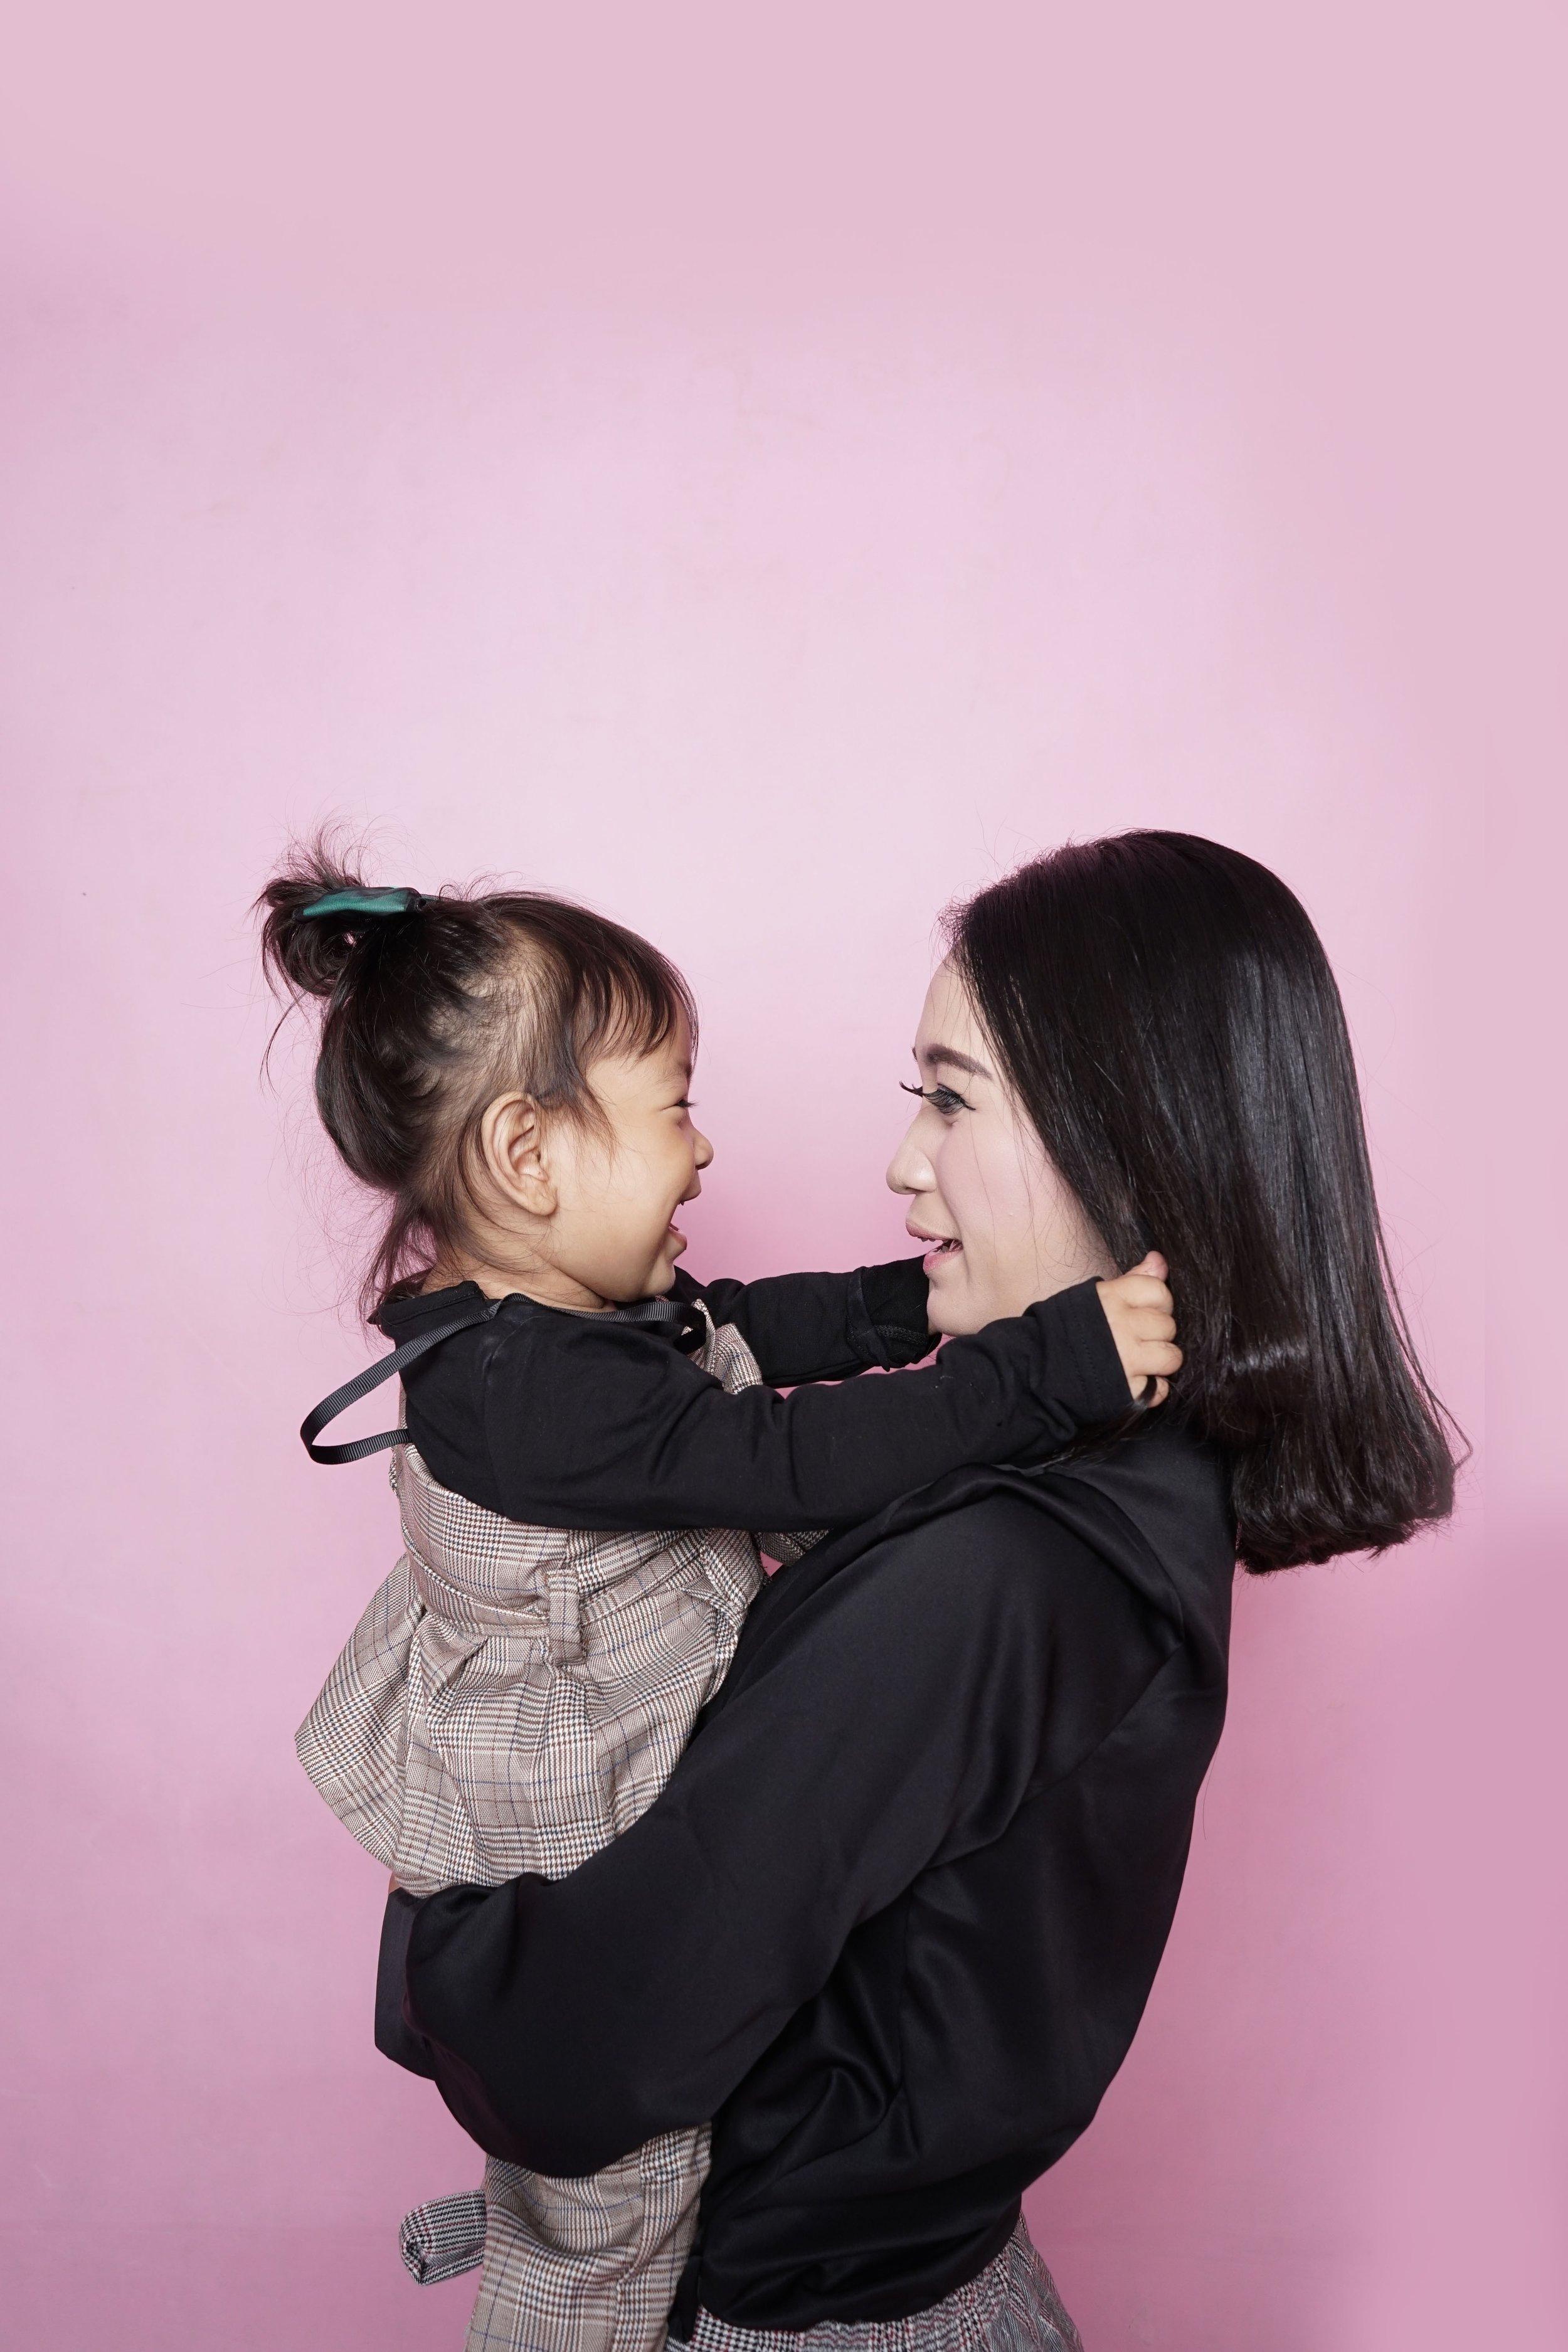 baby-child-daughter-1096141.jpg